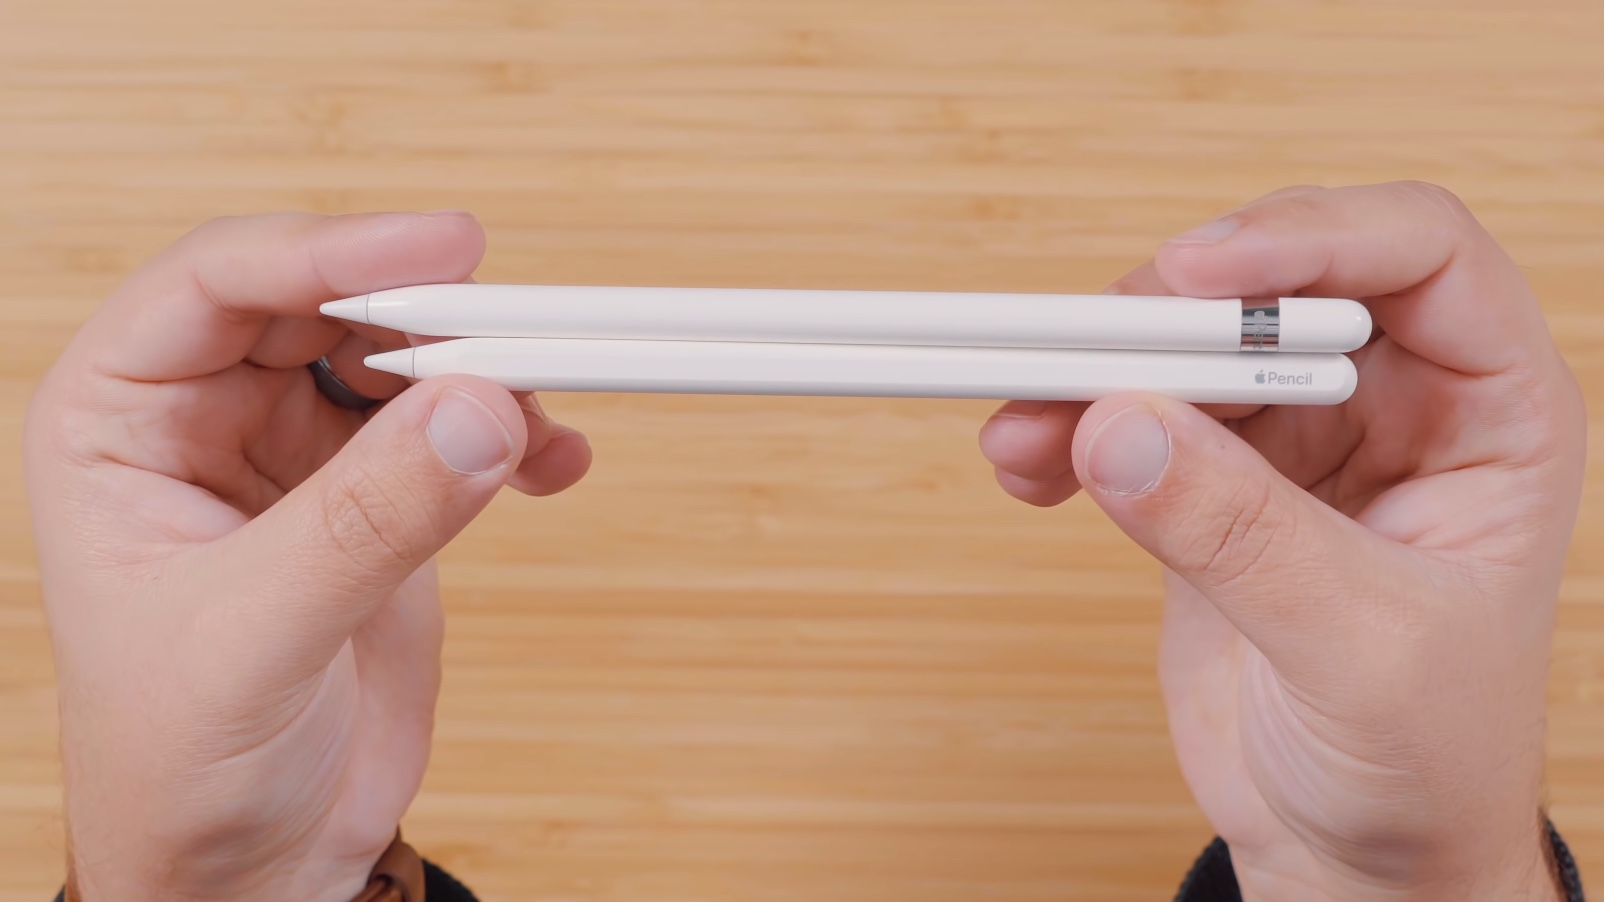 Pilih Mana: Apple Pencil 1 vs Apple Pencil 2